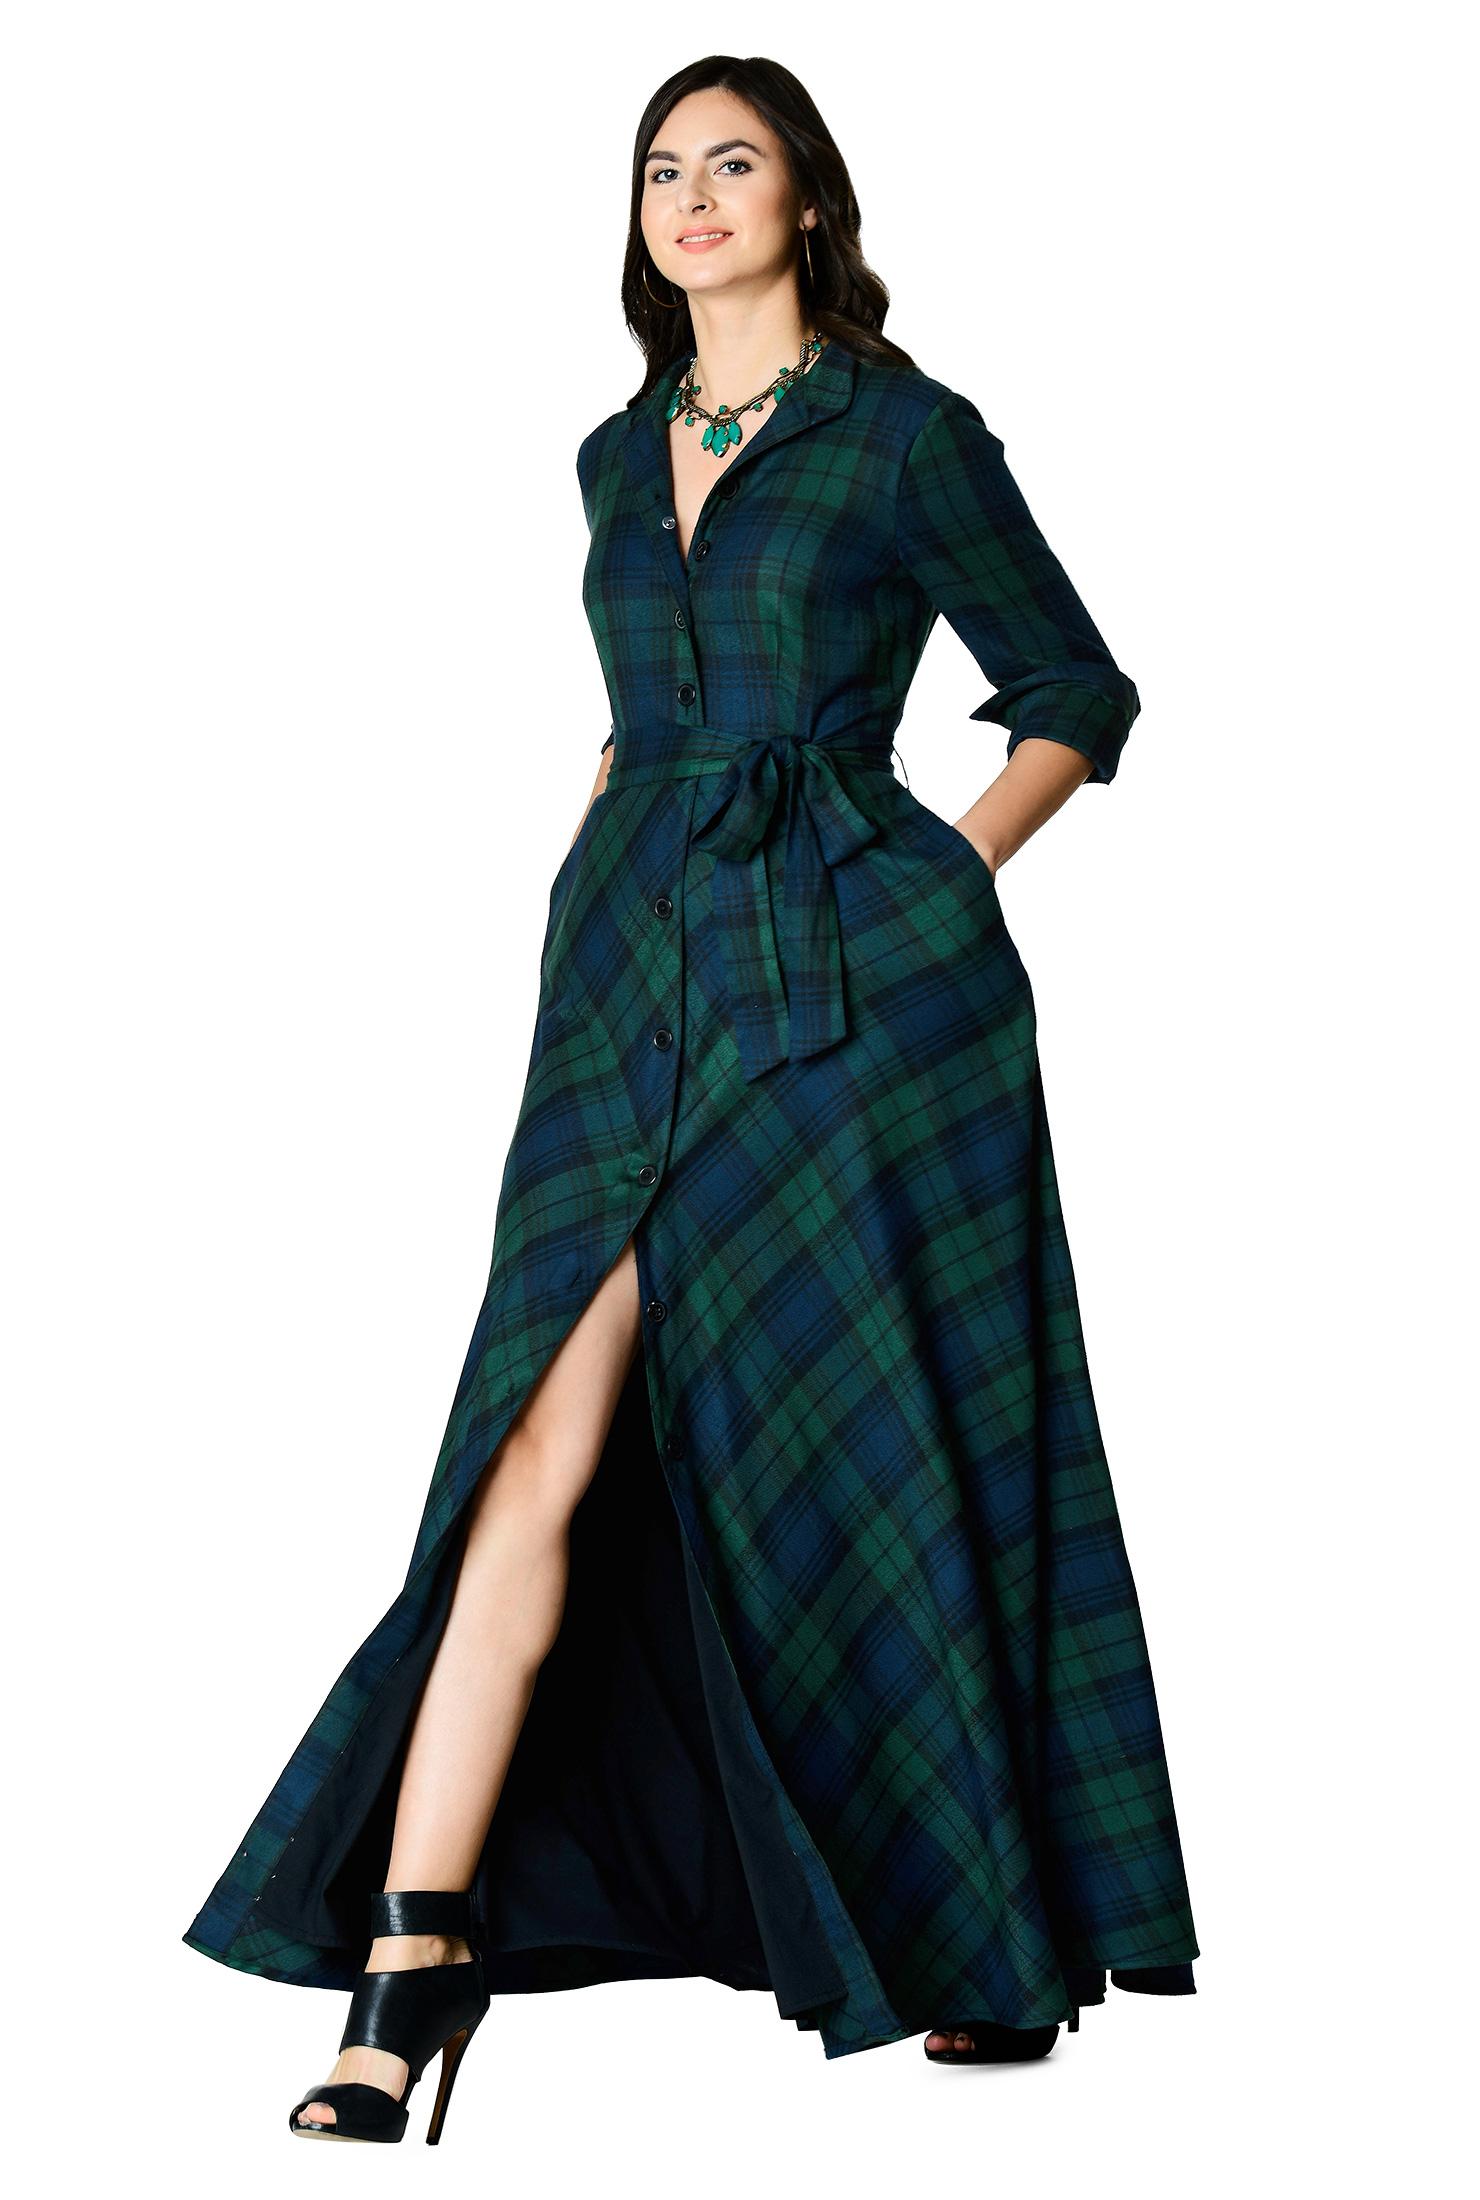 f9721f22c25 Women s Fashion Clothing 0-36W and Custom